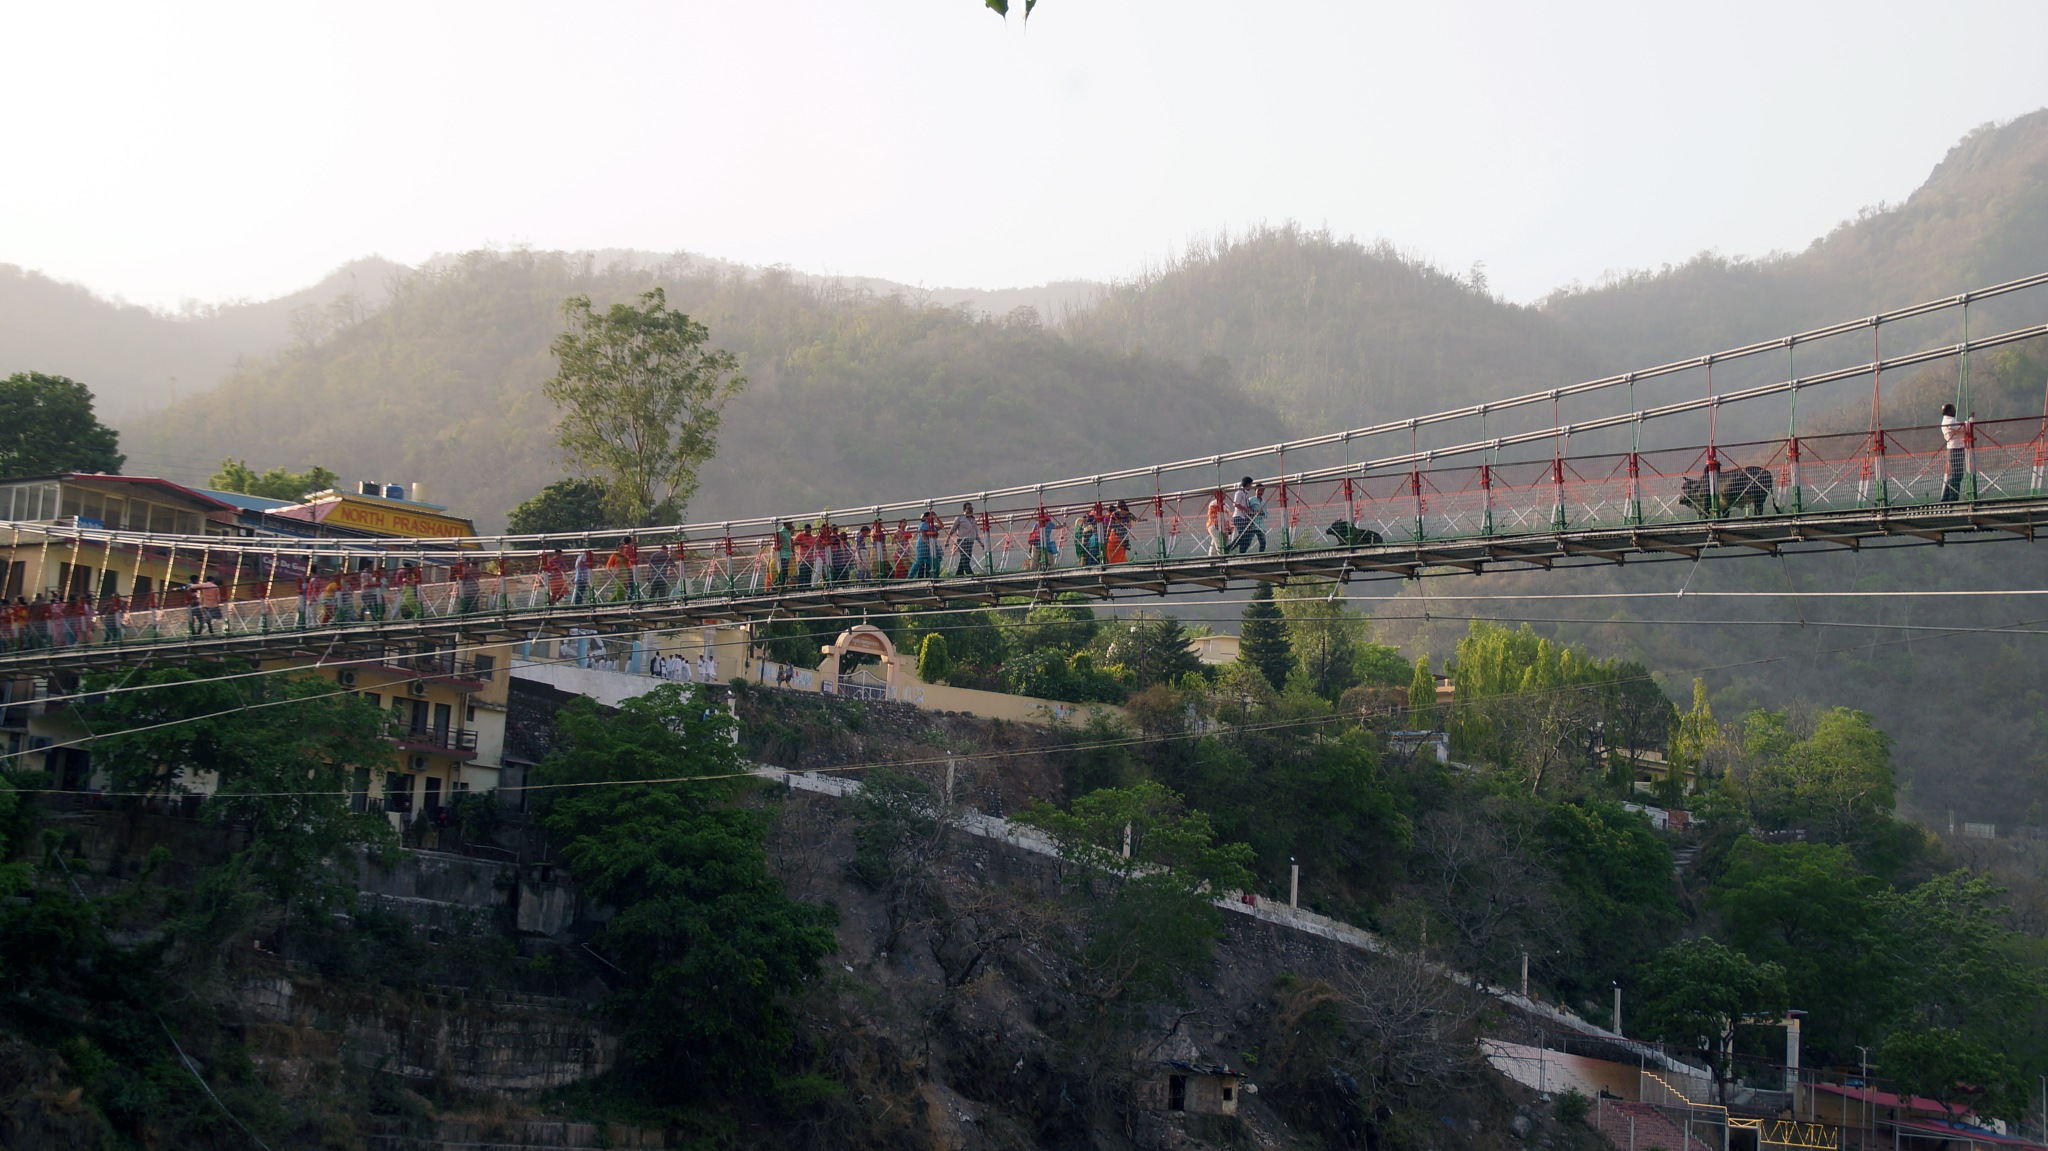 Laxman Jhula Bridge, Rishikesh, 2017 by lars.erlandsson.9